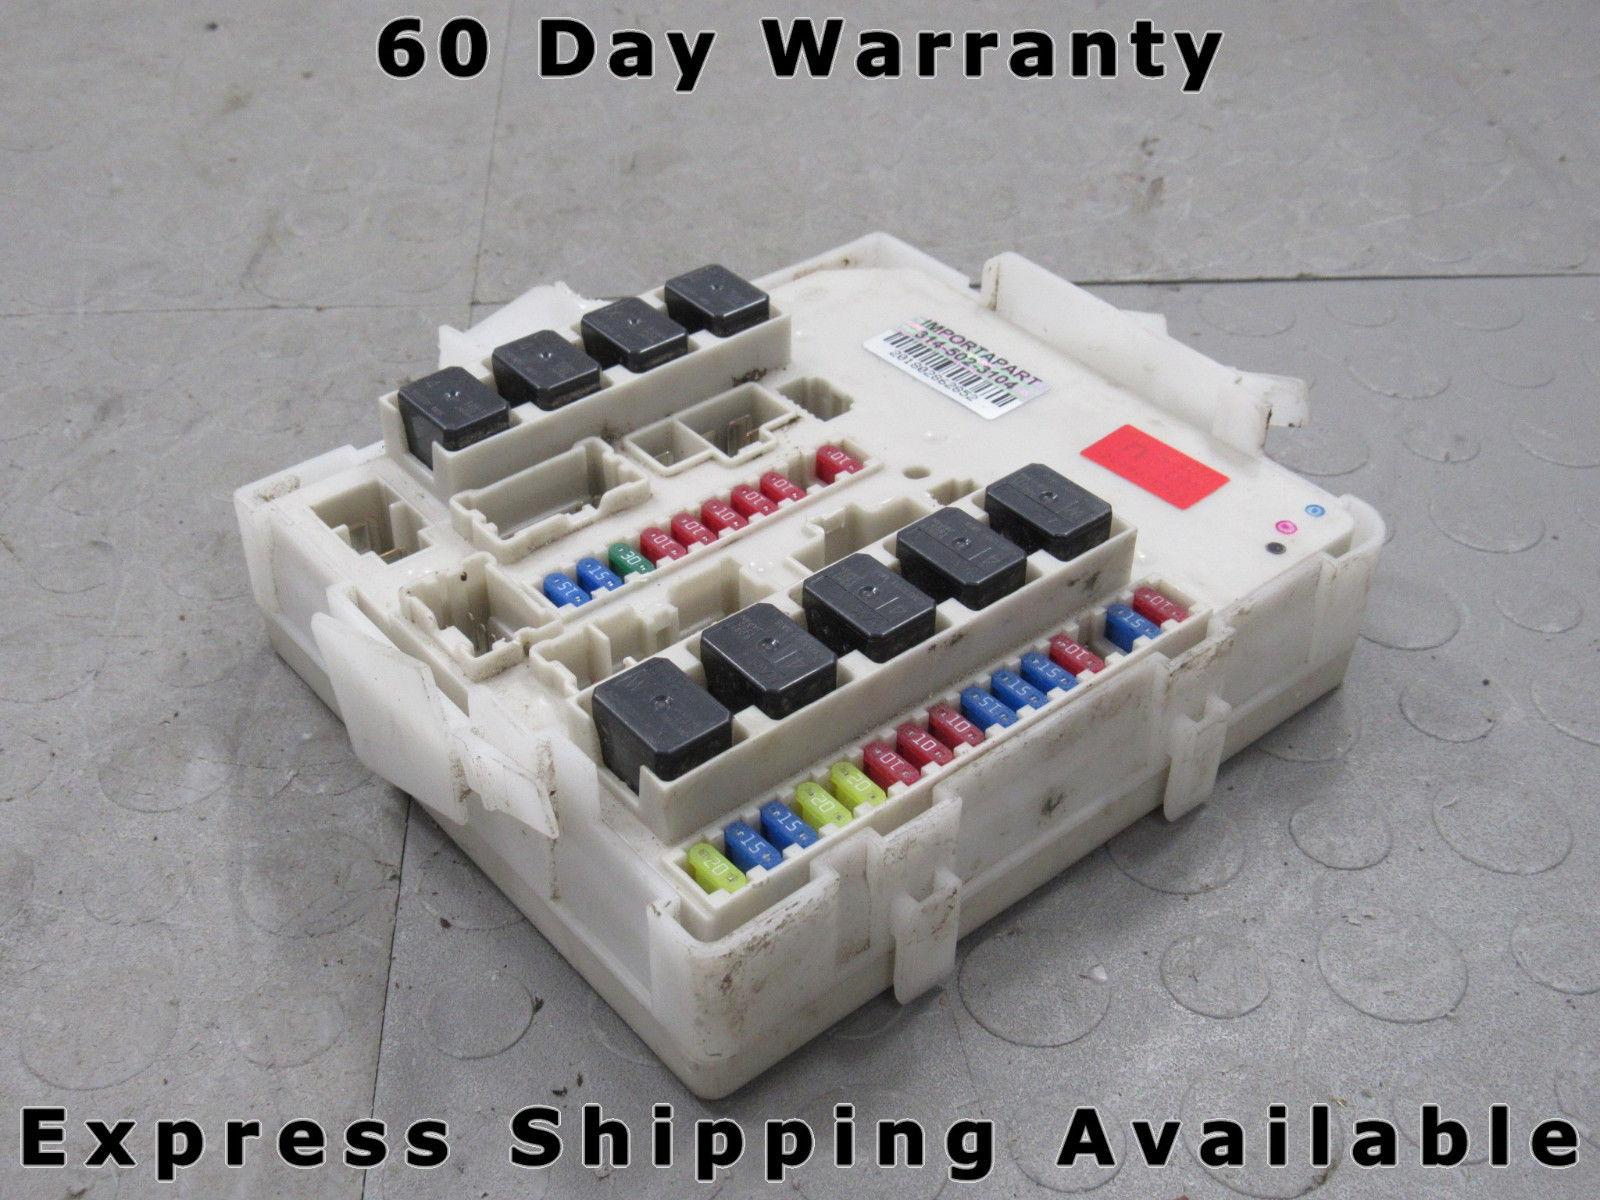 07 09 titan armada xterra qx56 ipdm bcm body module fuse box 284b6 rh  importapart com